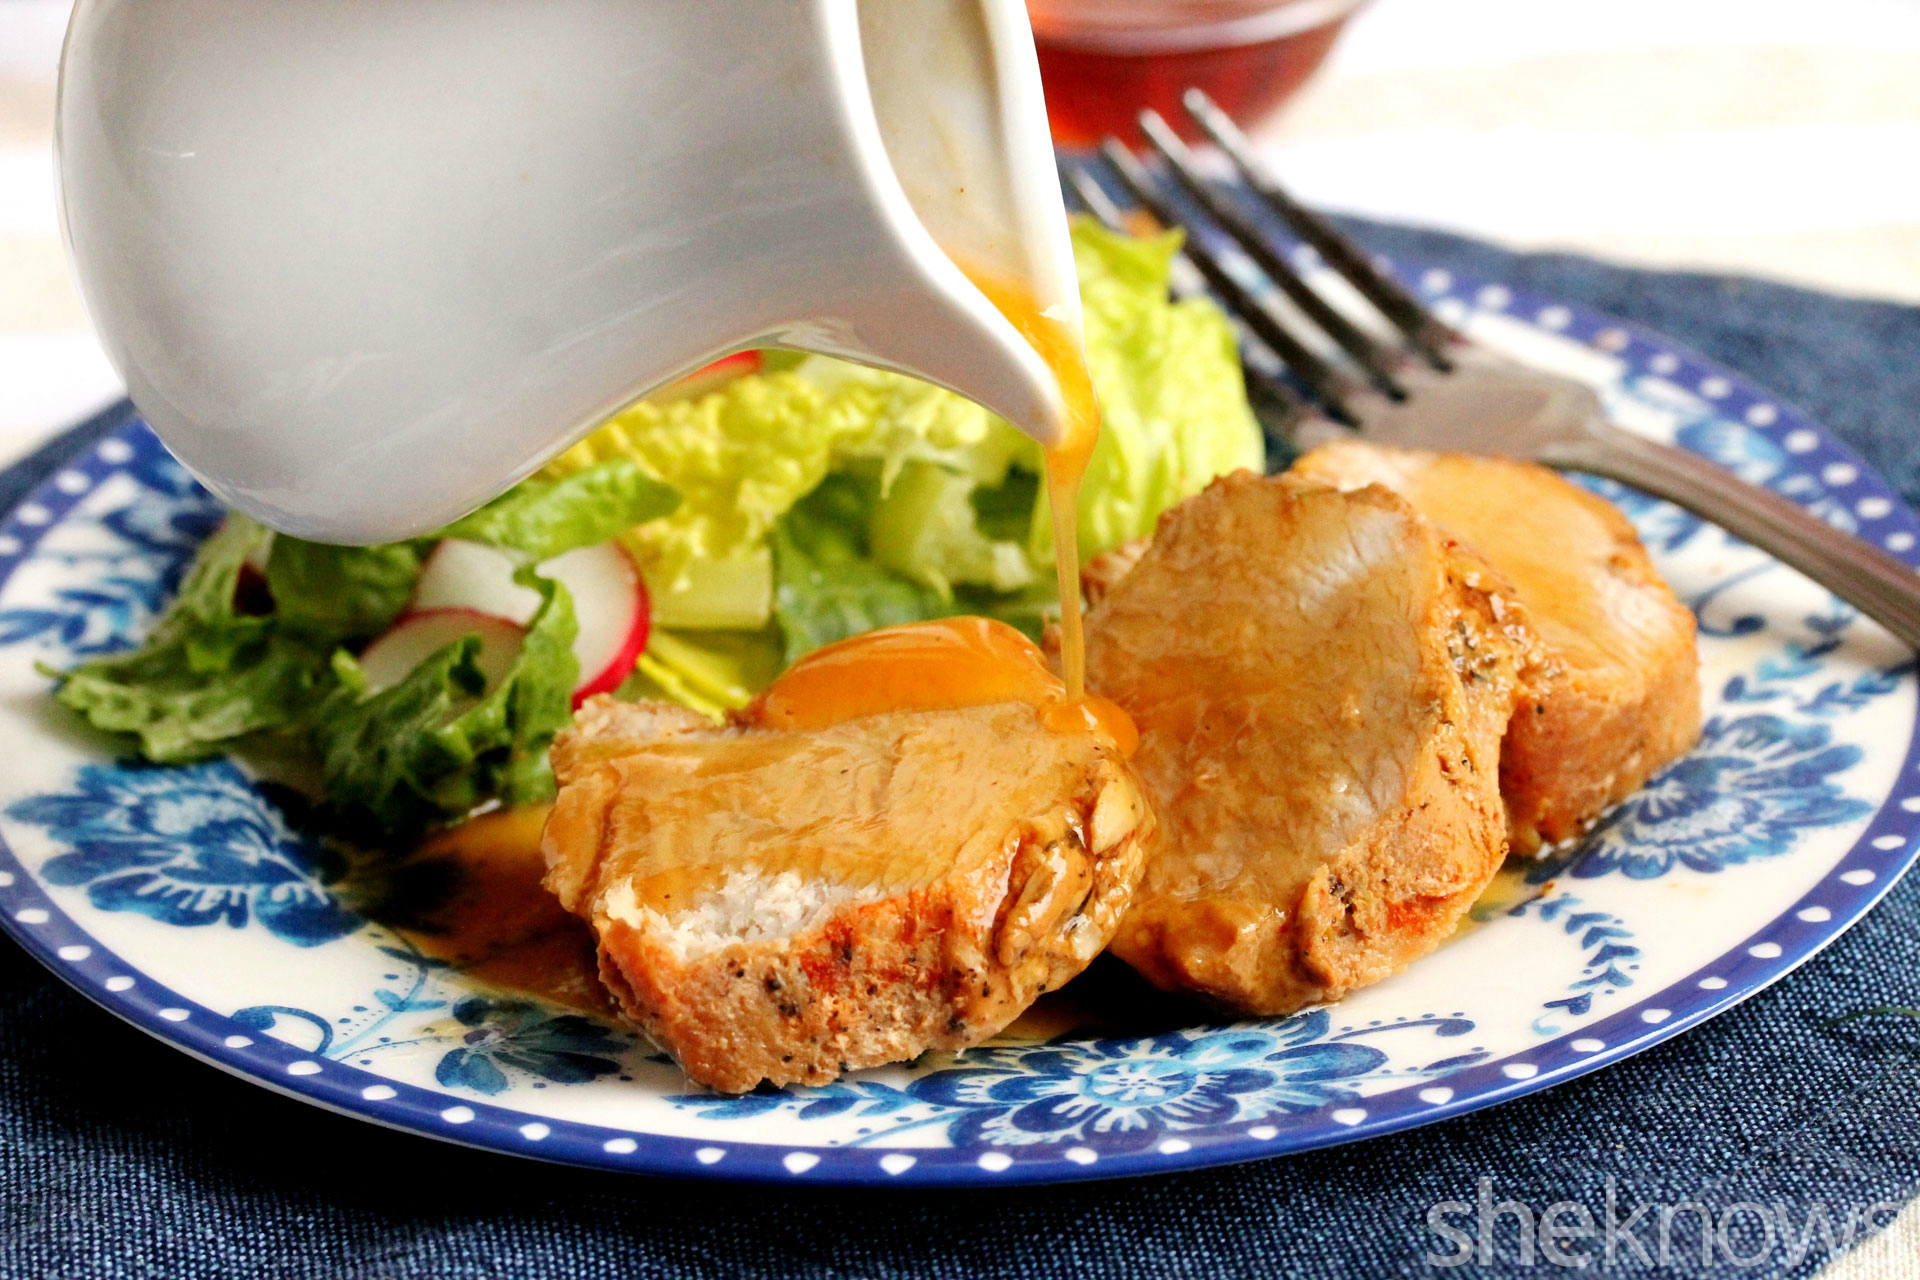 honey-garlic-sauce-on-pork-tenderloin